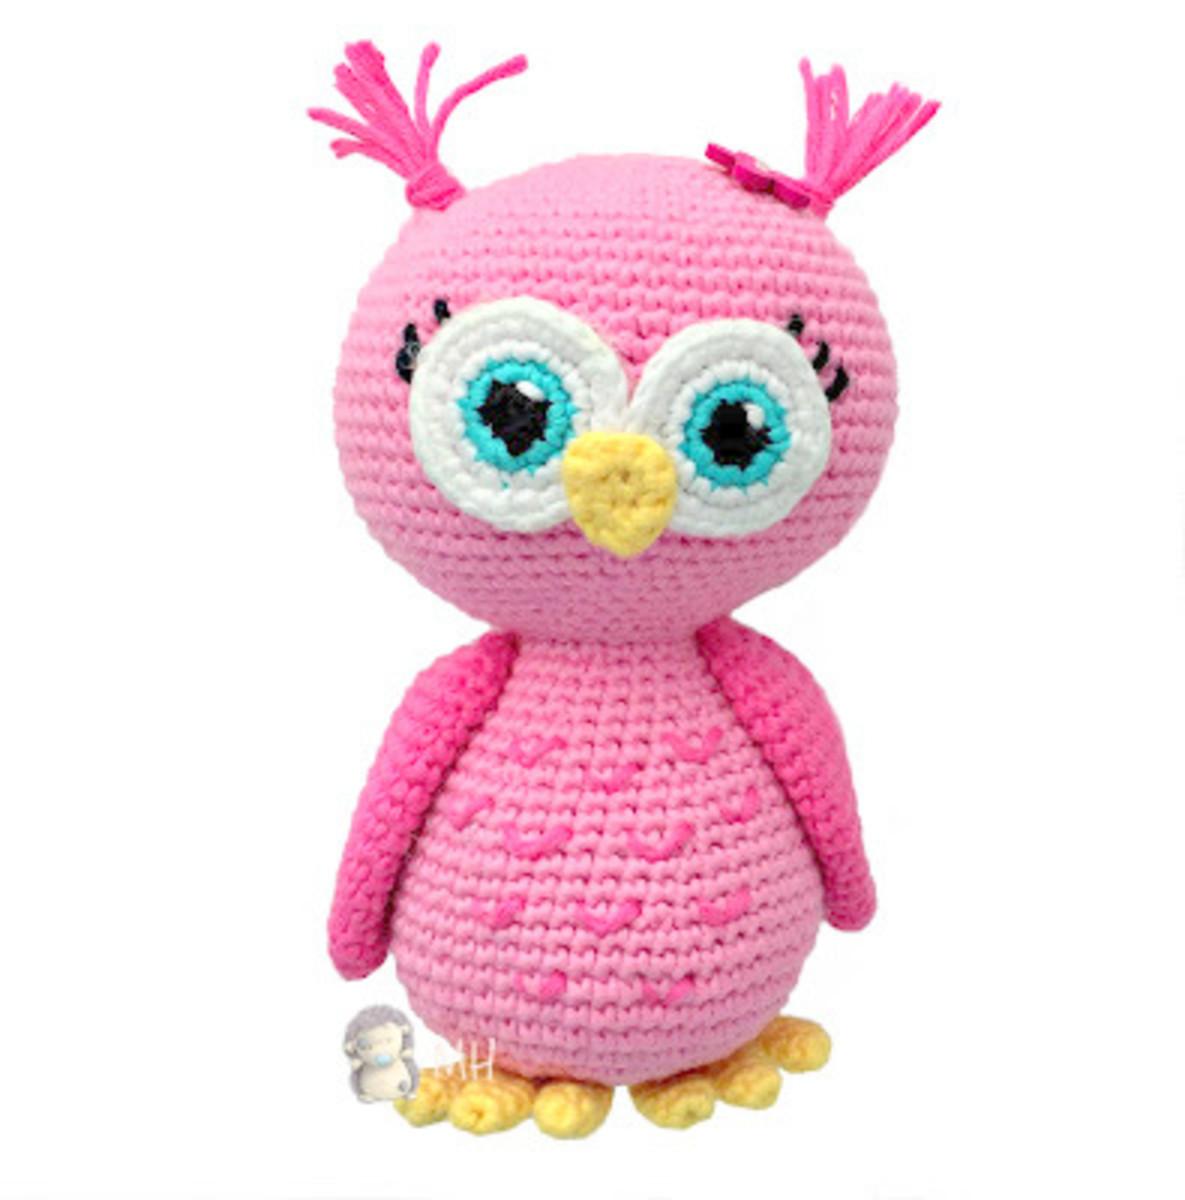 Free Crochet Pattern: Pink Owl Amigurumi Doll